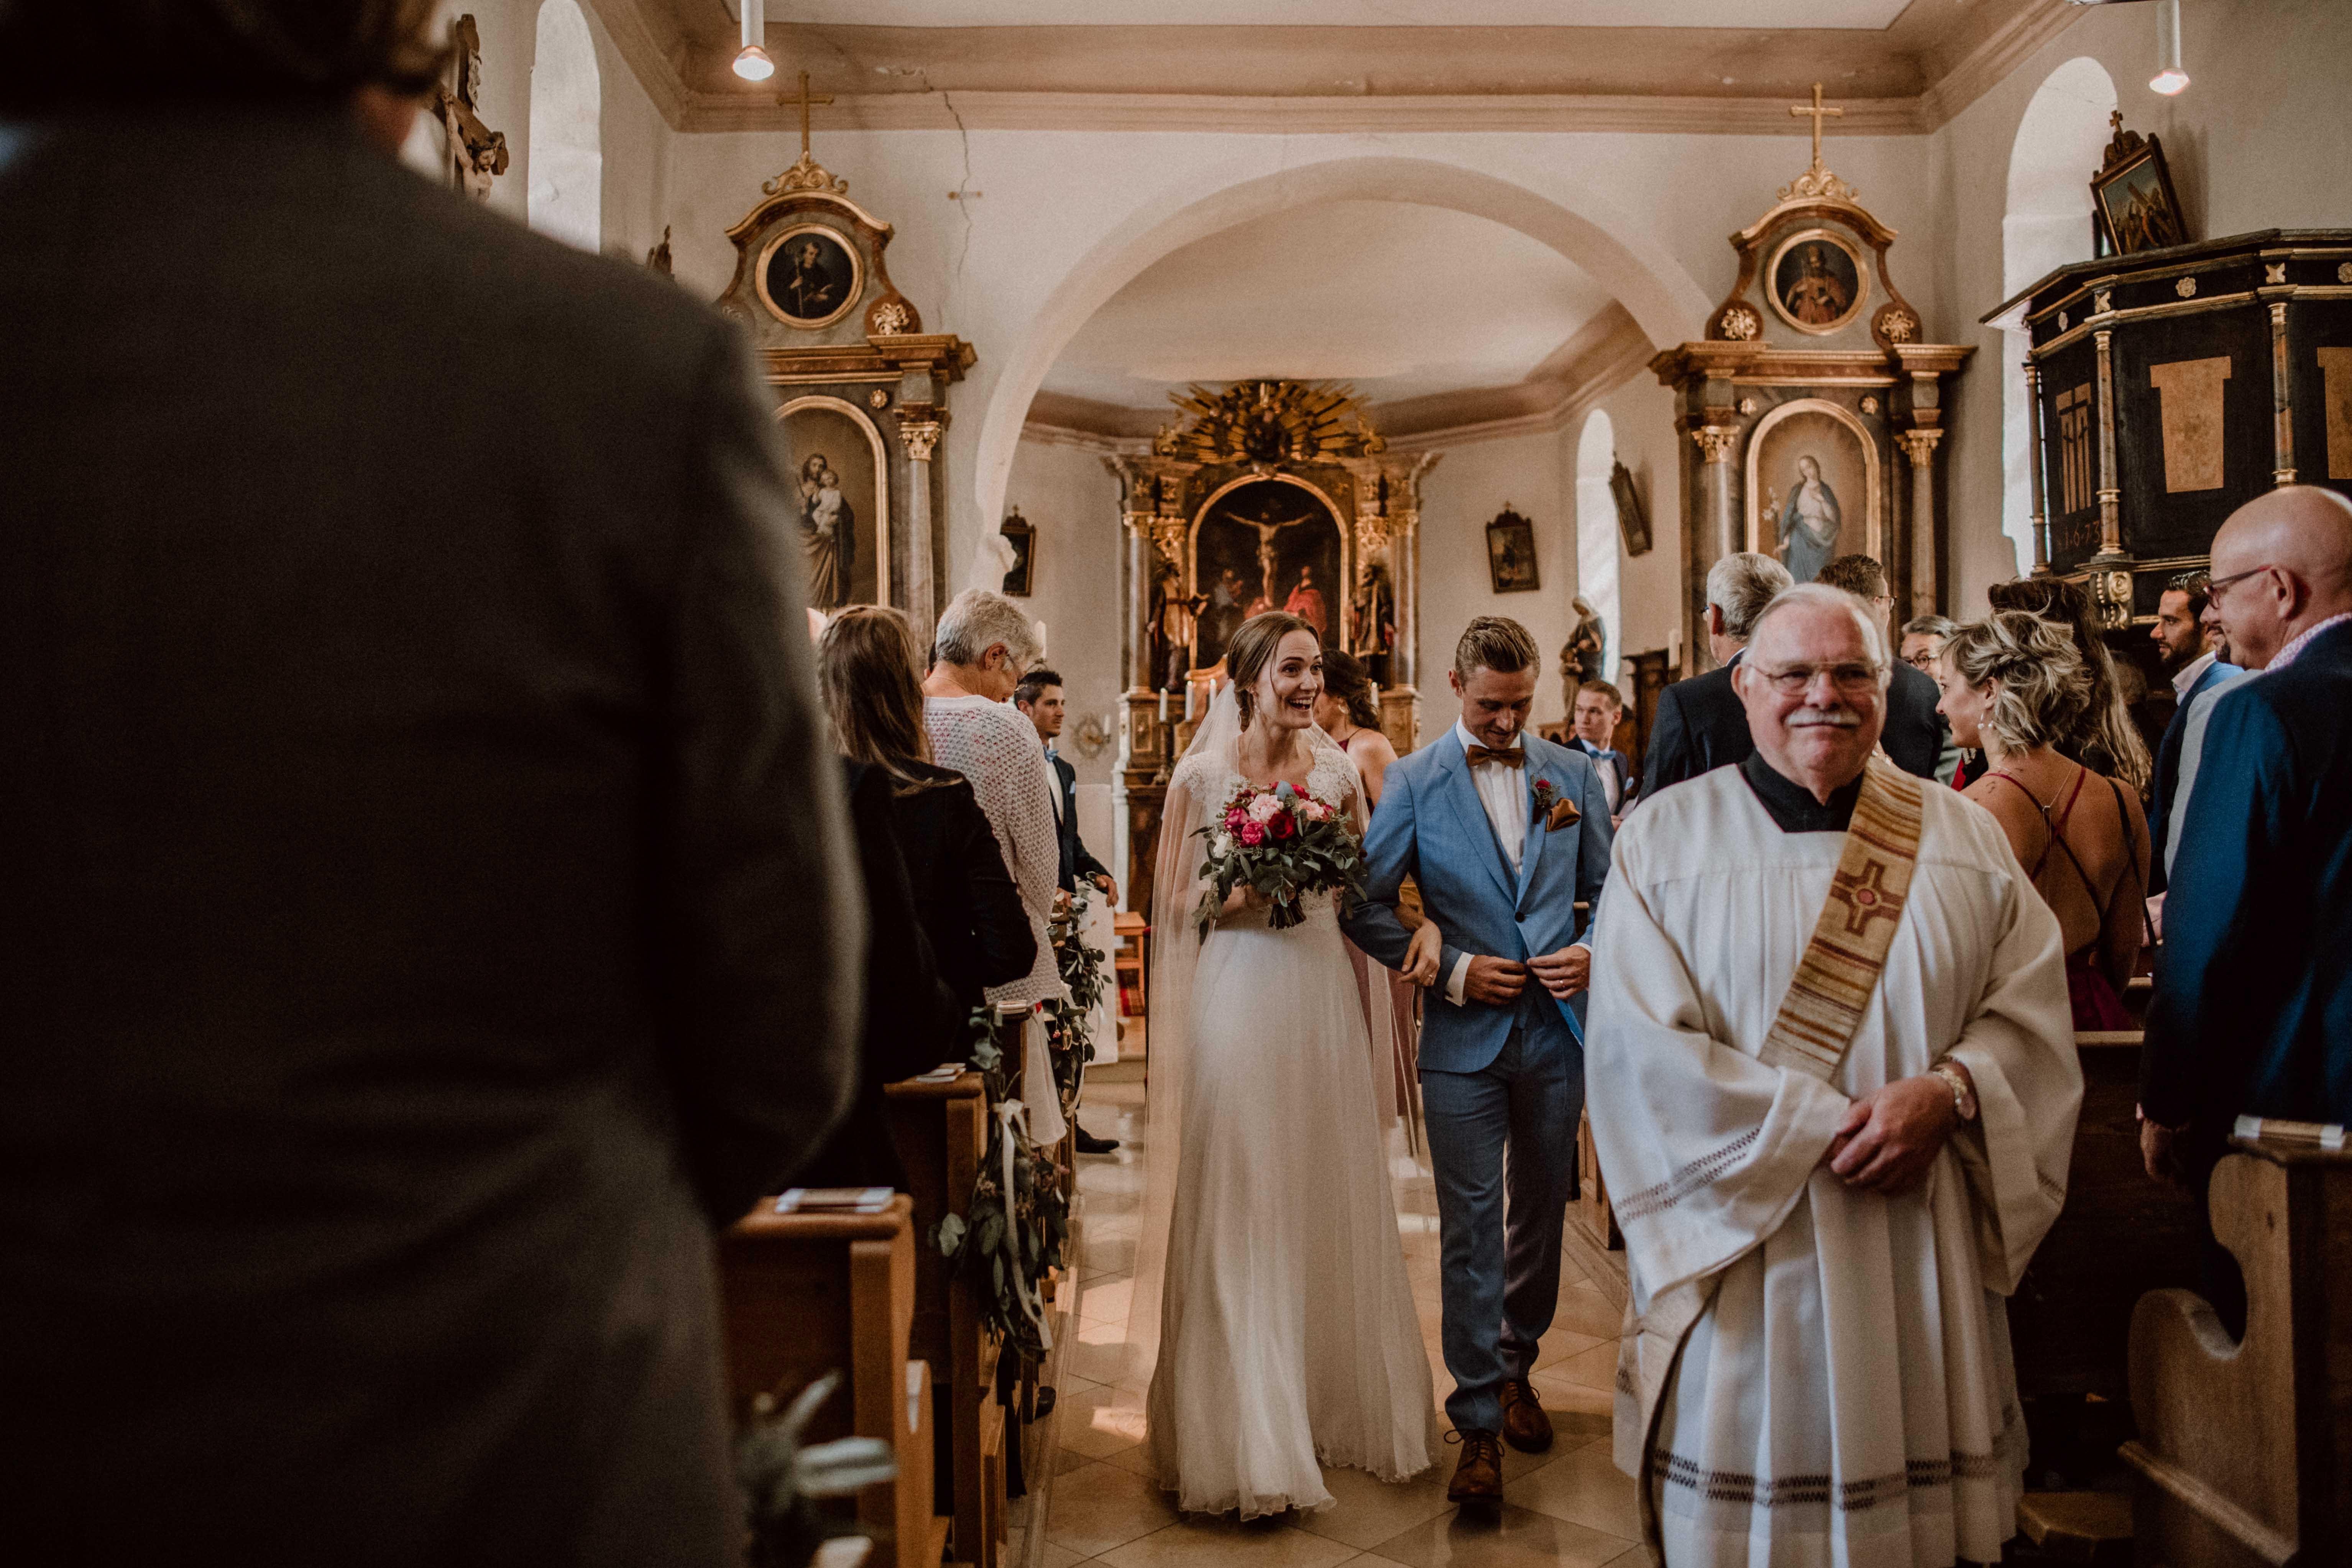 auszug church sonja poehlmann photography couples muenchen bayern